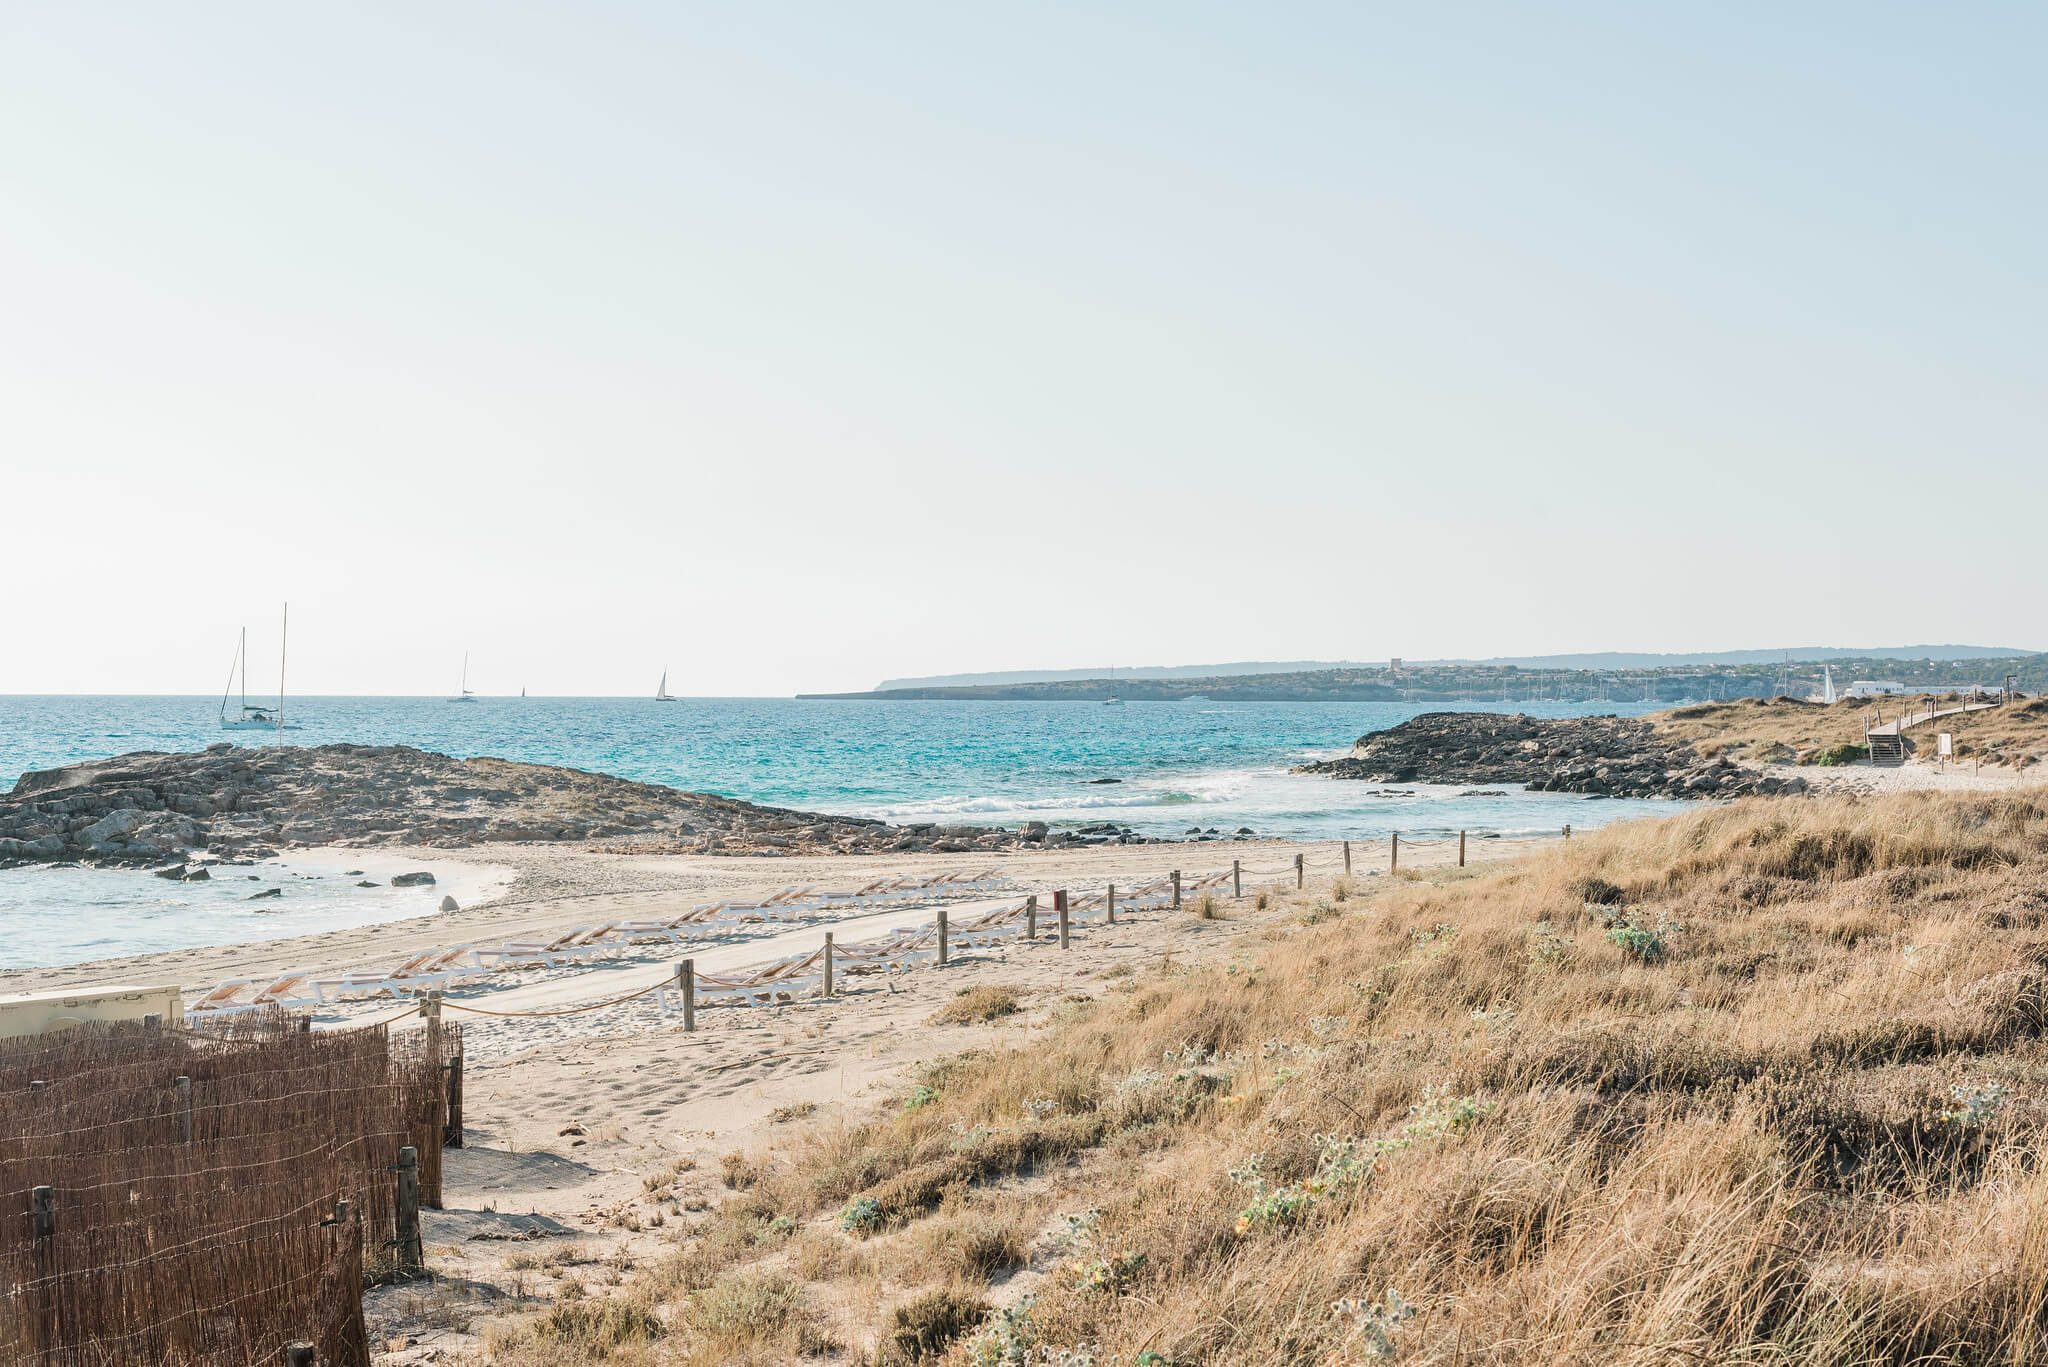 https://www.white-ibiza.com/wp-content/uploads/2020/03/formentera-beaches-es-caval-den-borras-2020-03.jpg